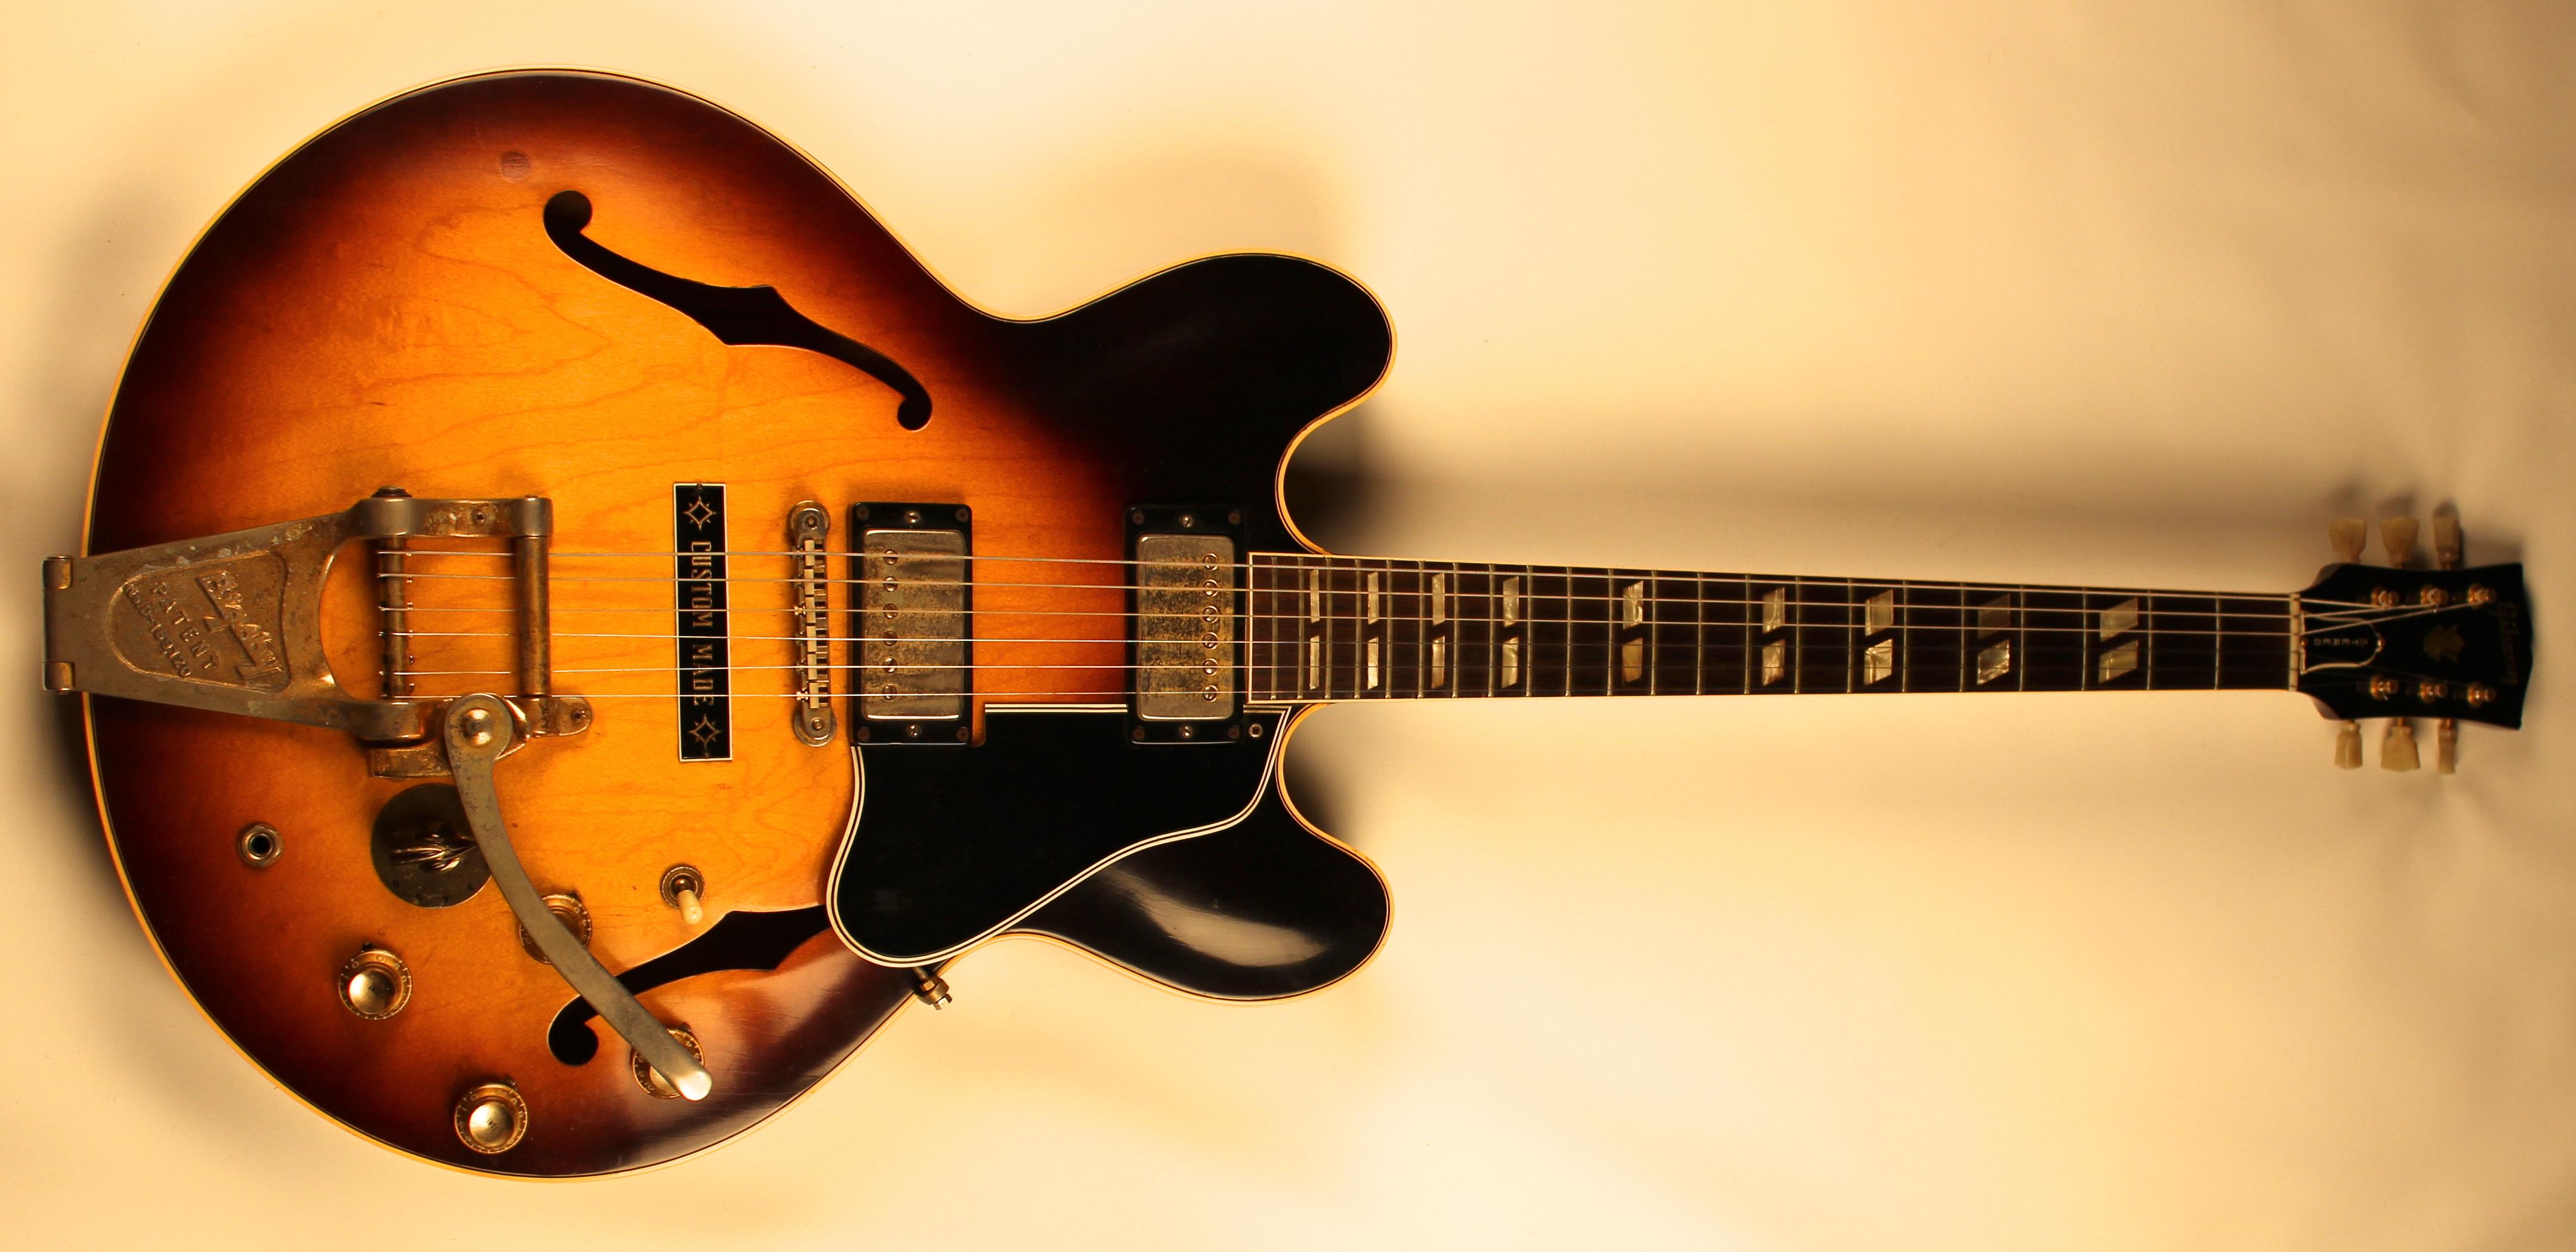 drew berlin 39 s vintage guitars 1963 gibson es 345 sun burst. Black Bedroom Furniture Sets. Home Design Ideas